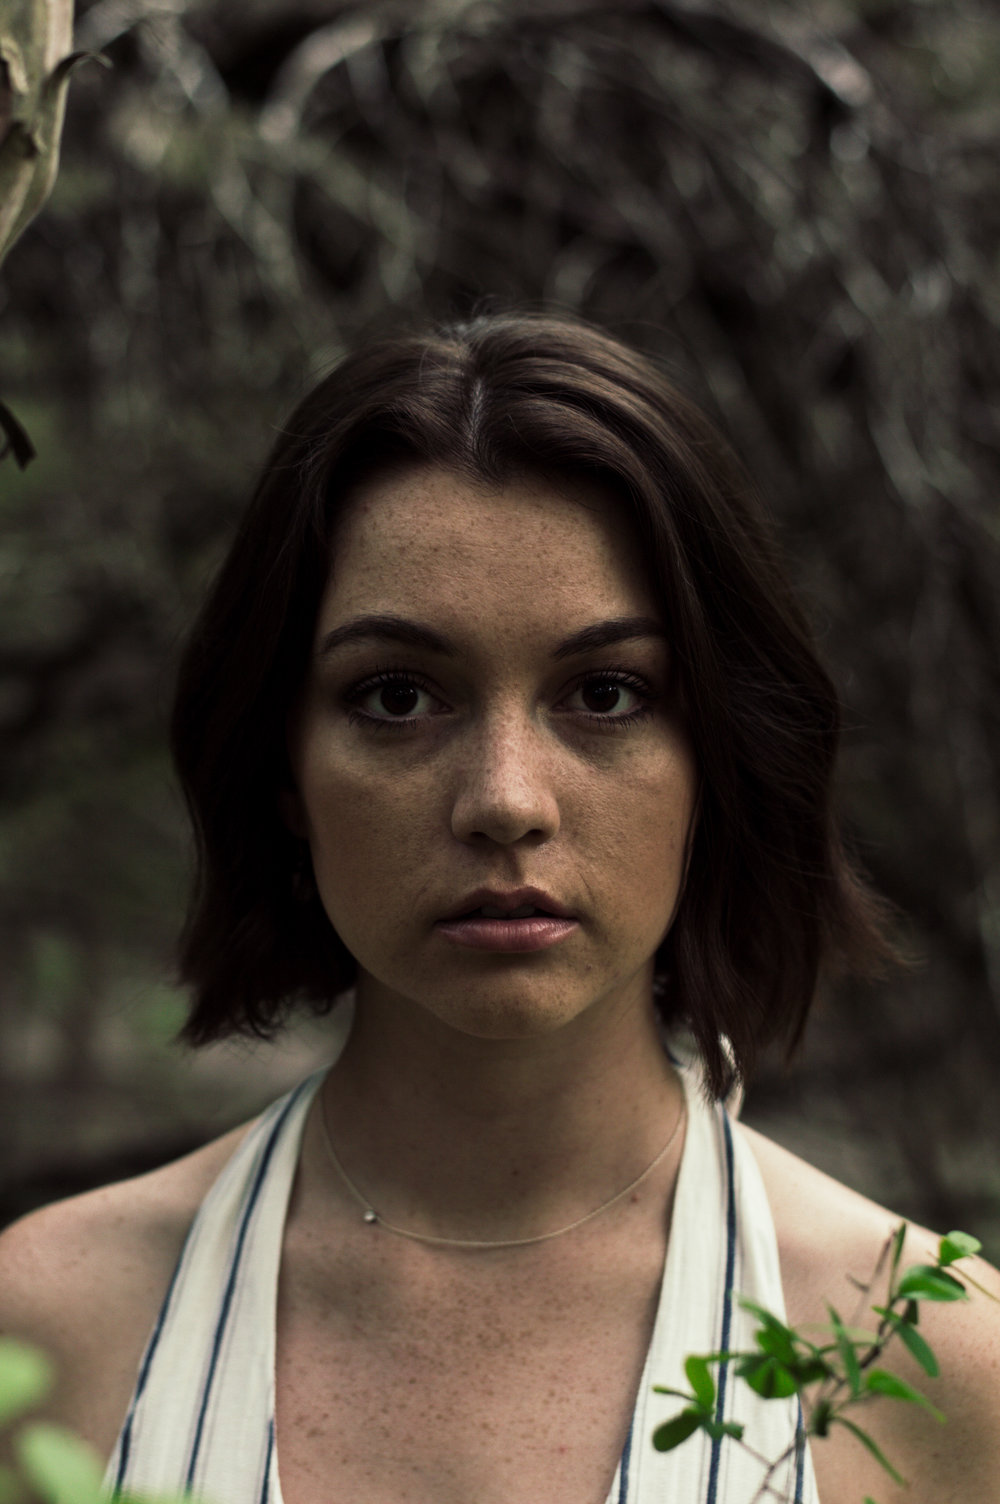 Katie - Student / Actress / Graduate